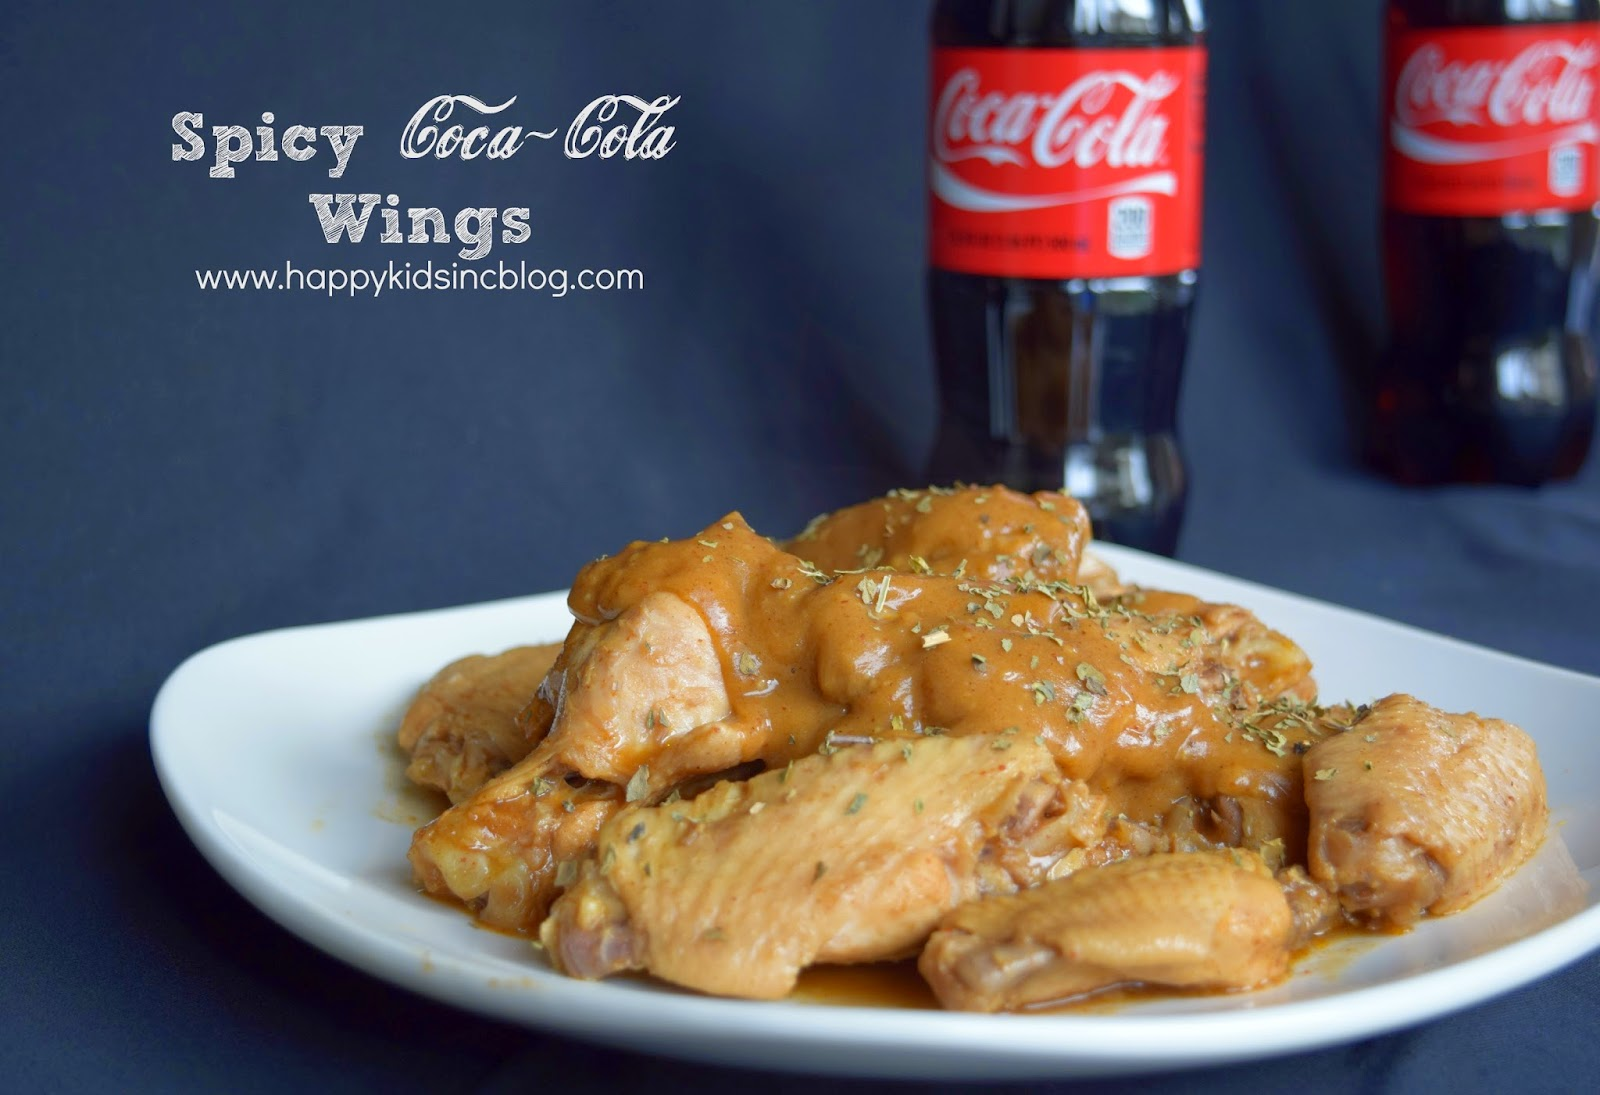 Big Game Coke Coca Cola Spicy Wings Appetizer Super Bowl